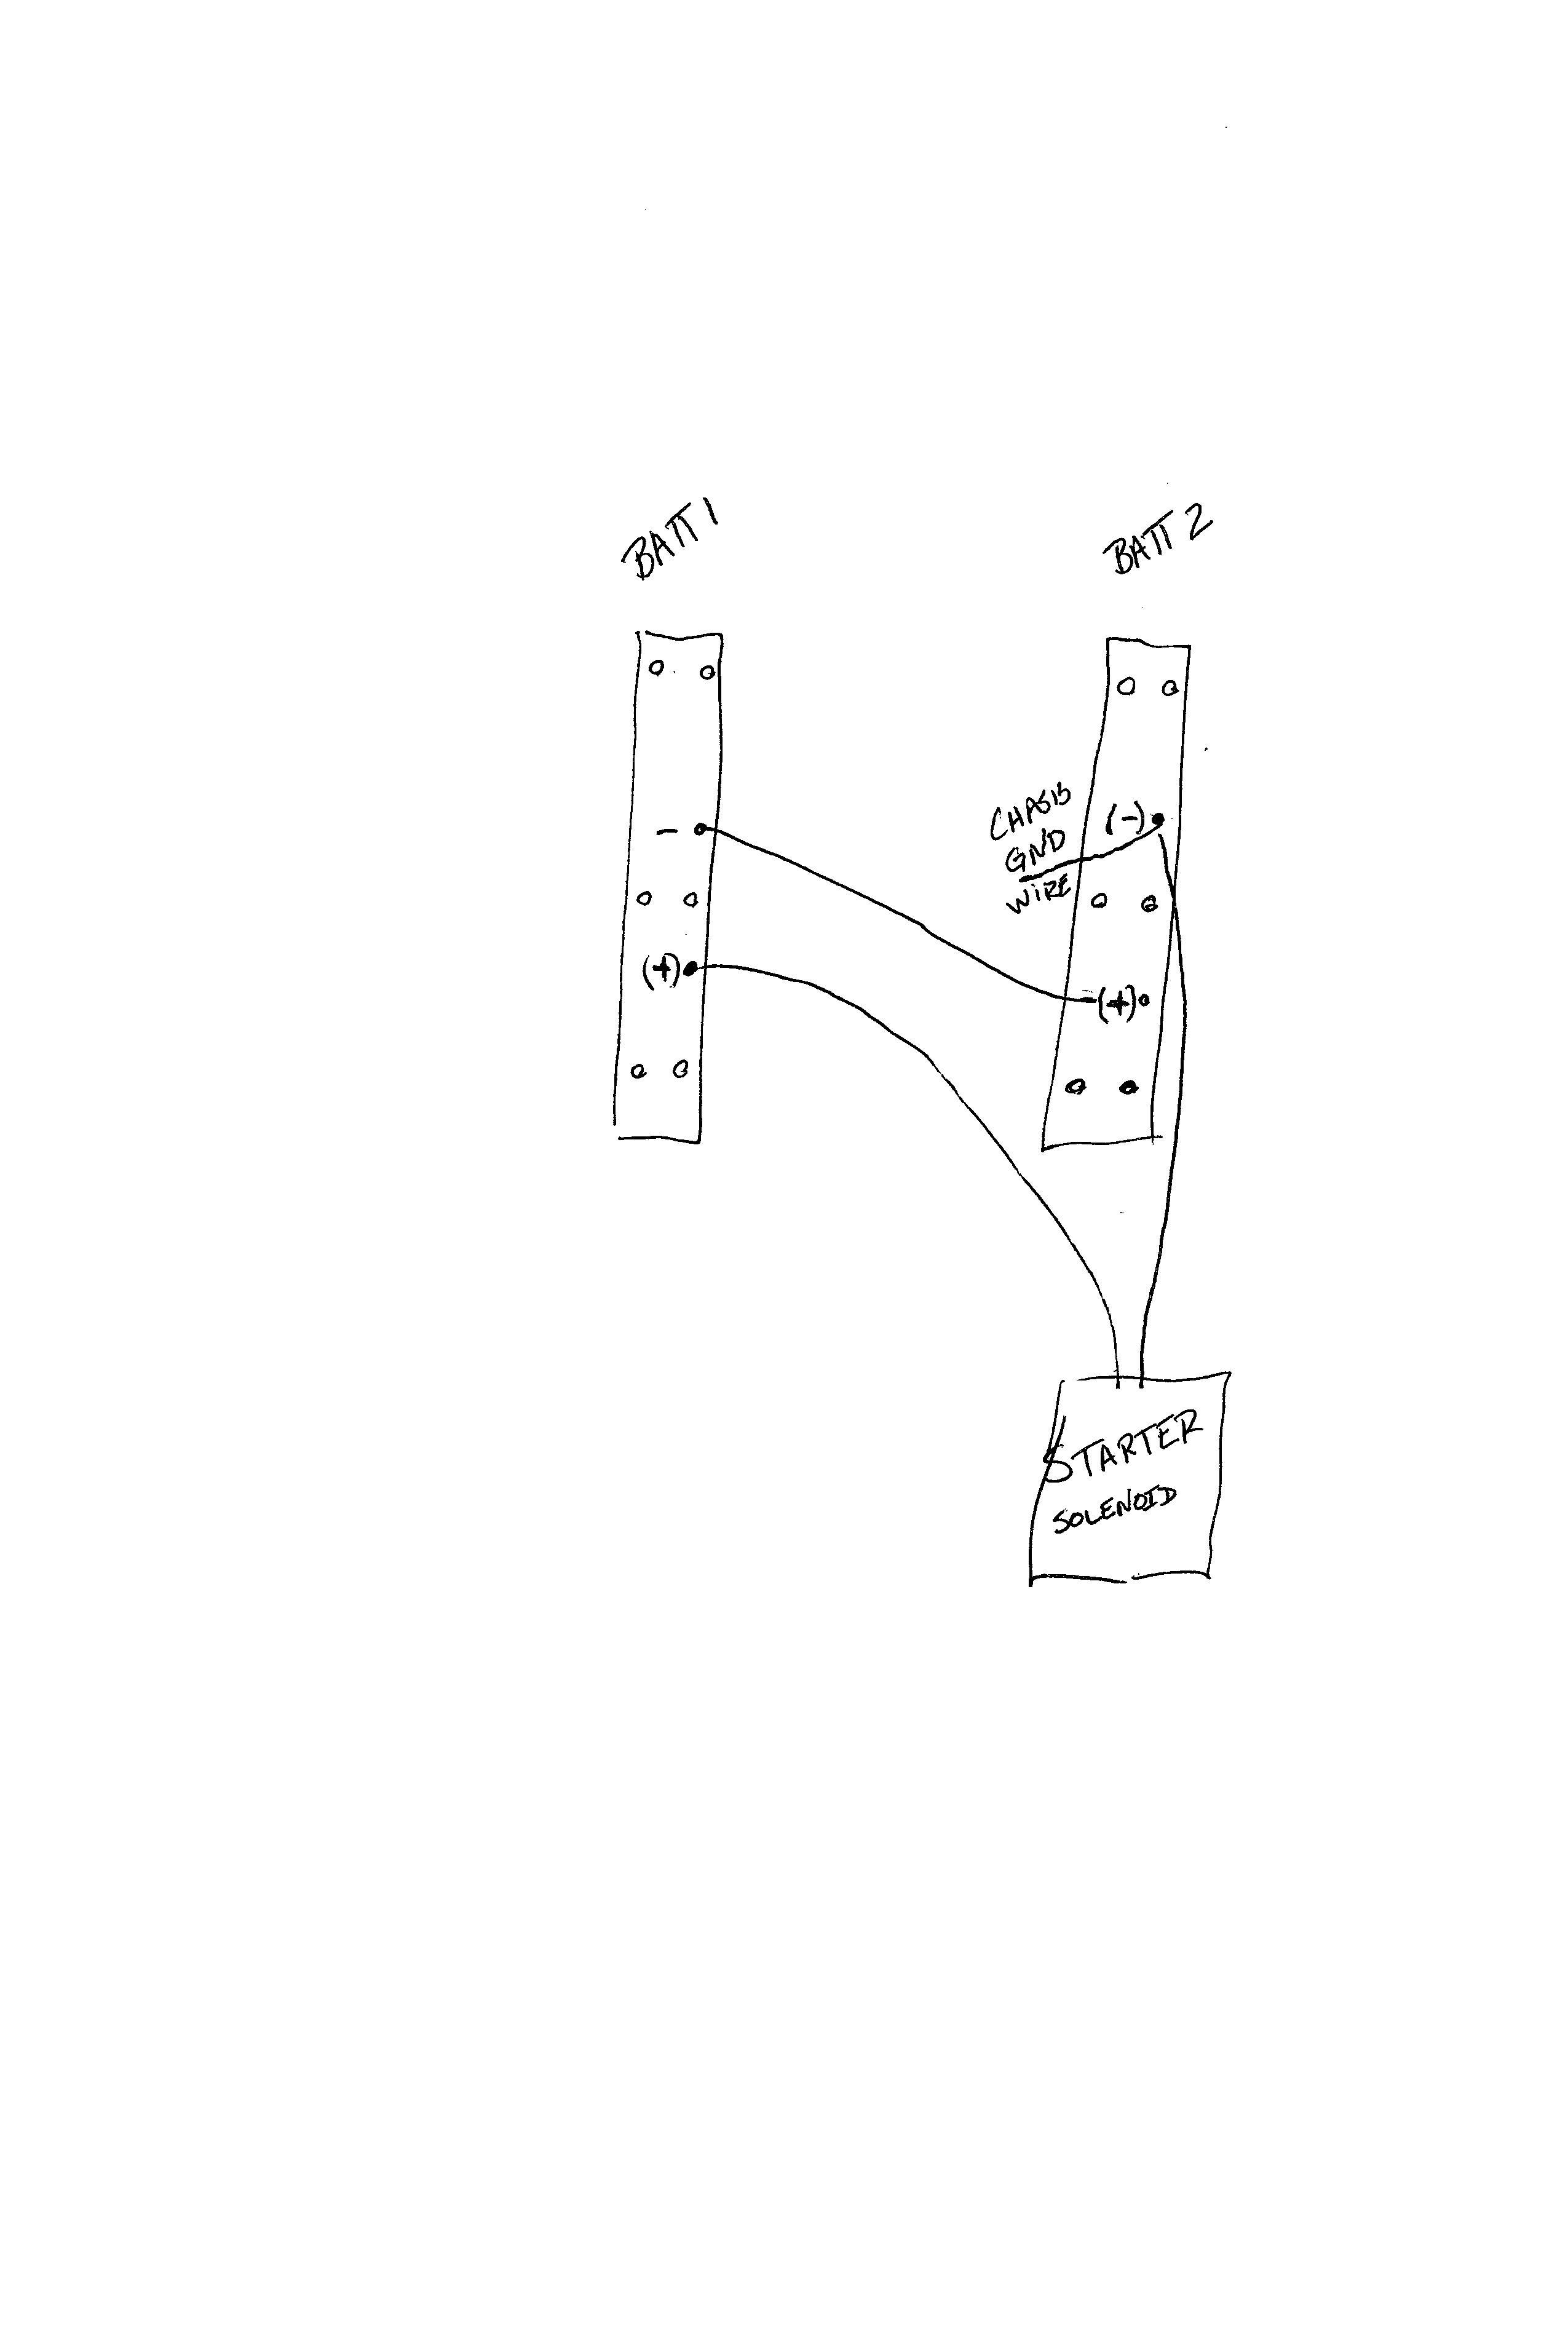 John Deere 3020 sel 24V Electrical System on